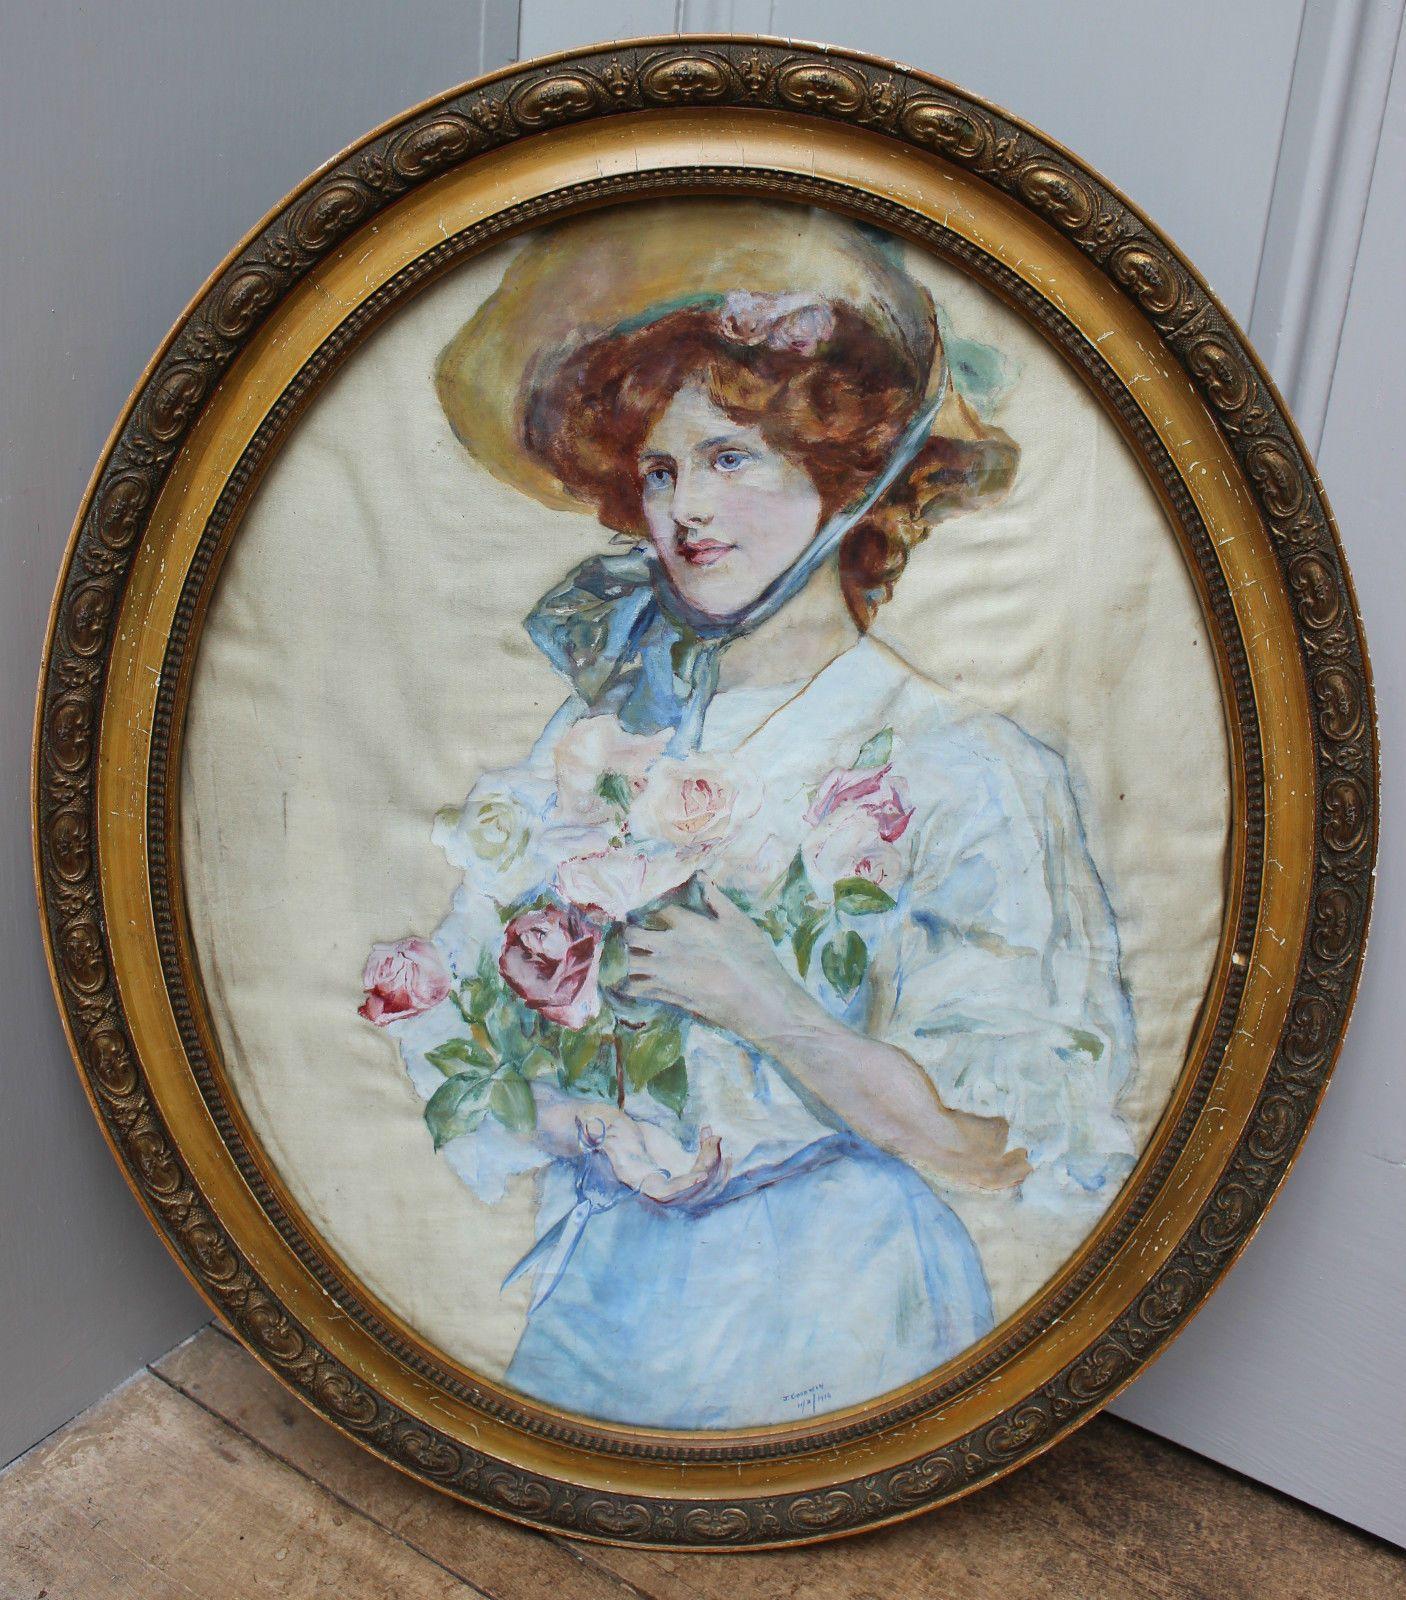 Watercolour Portrait Beautiful Young Lady by J Goodwin 1914 | eBay